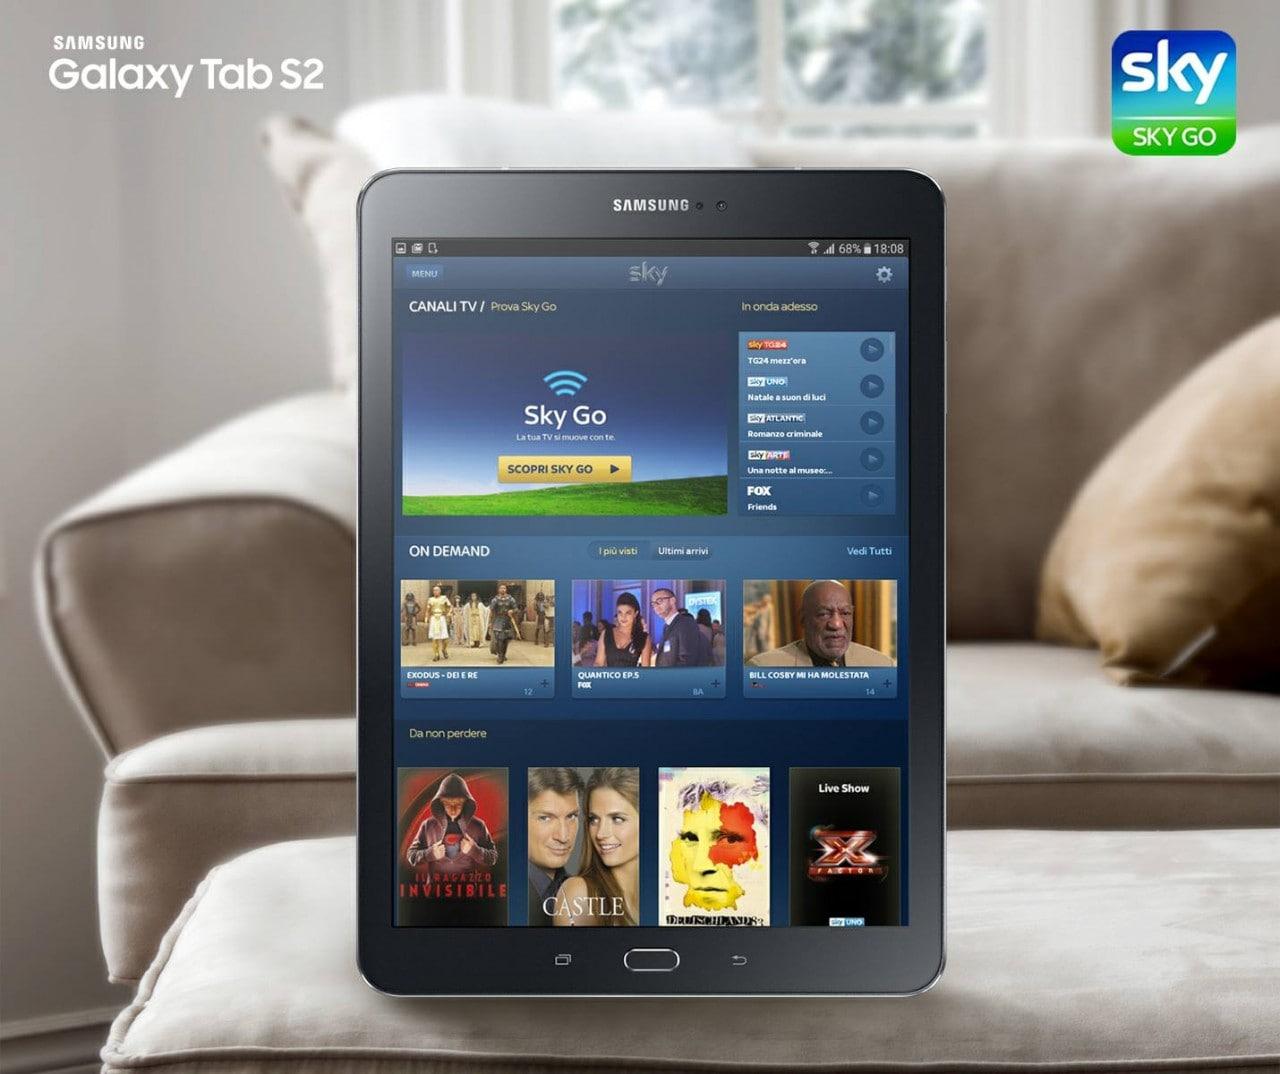 SkyGo Galaxy Tab S2